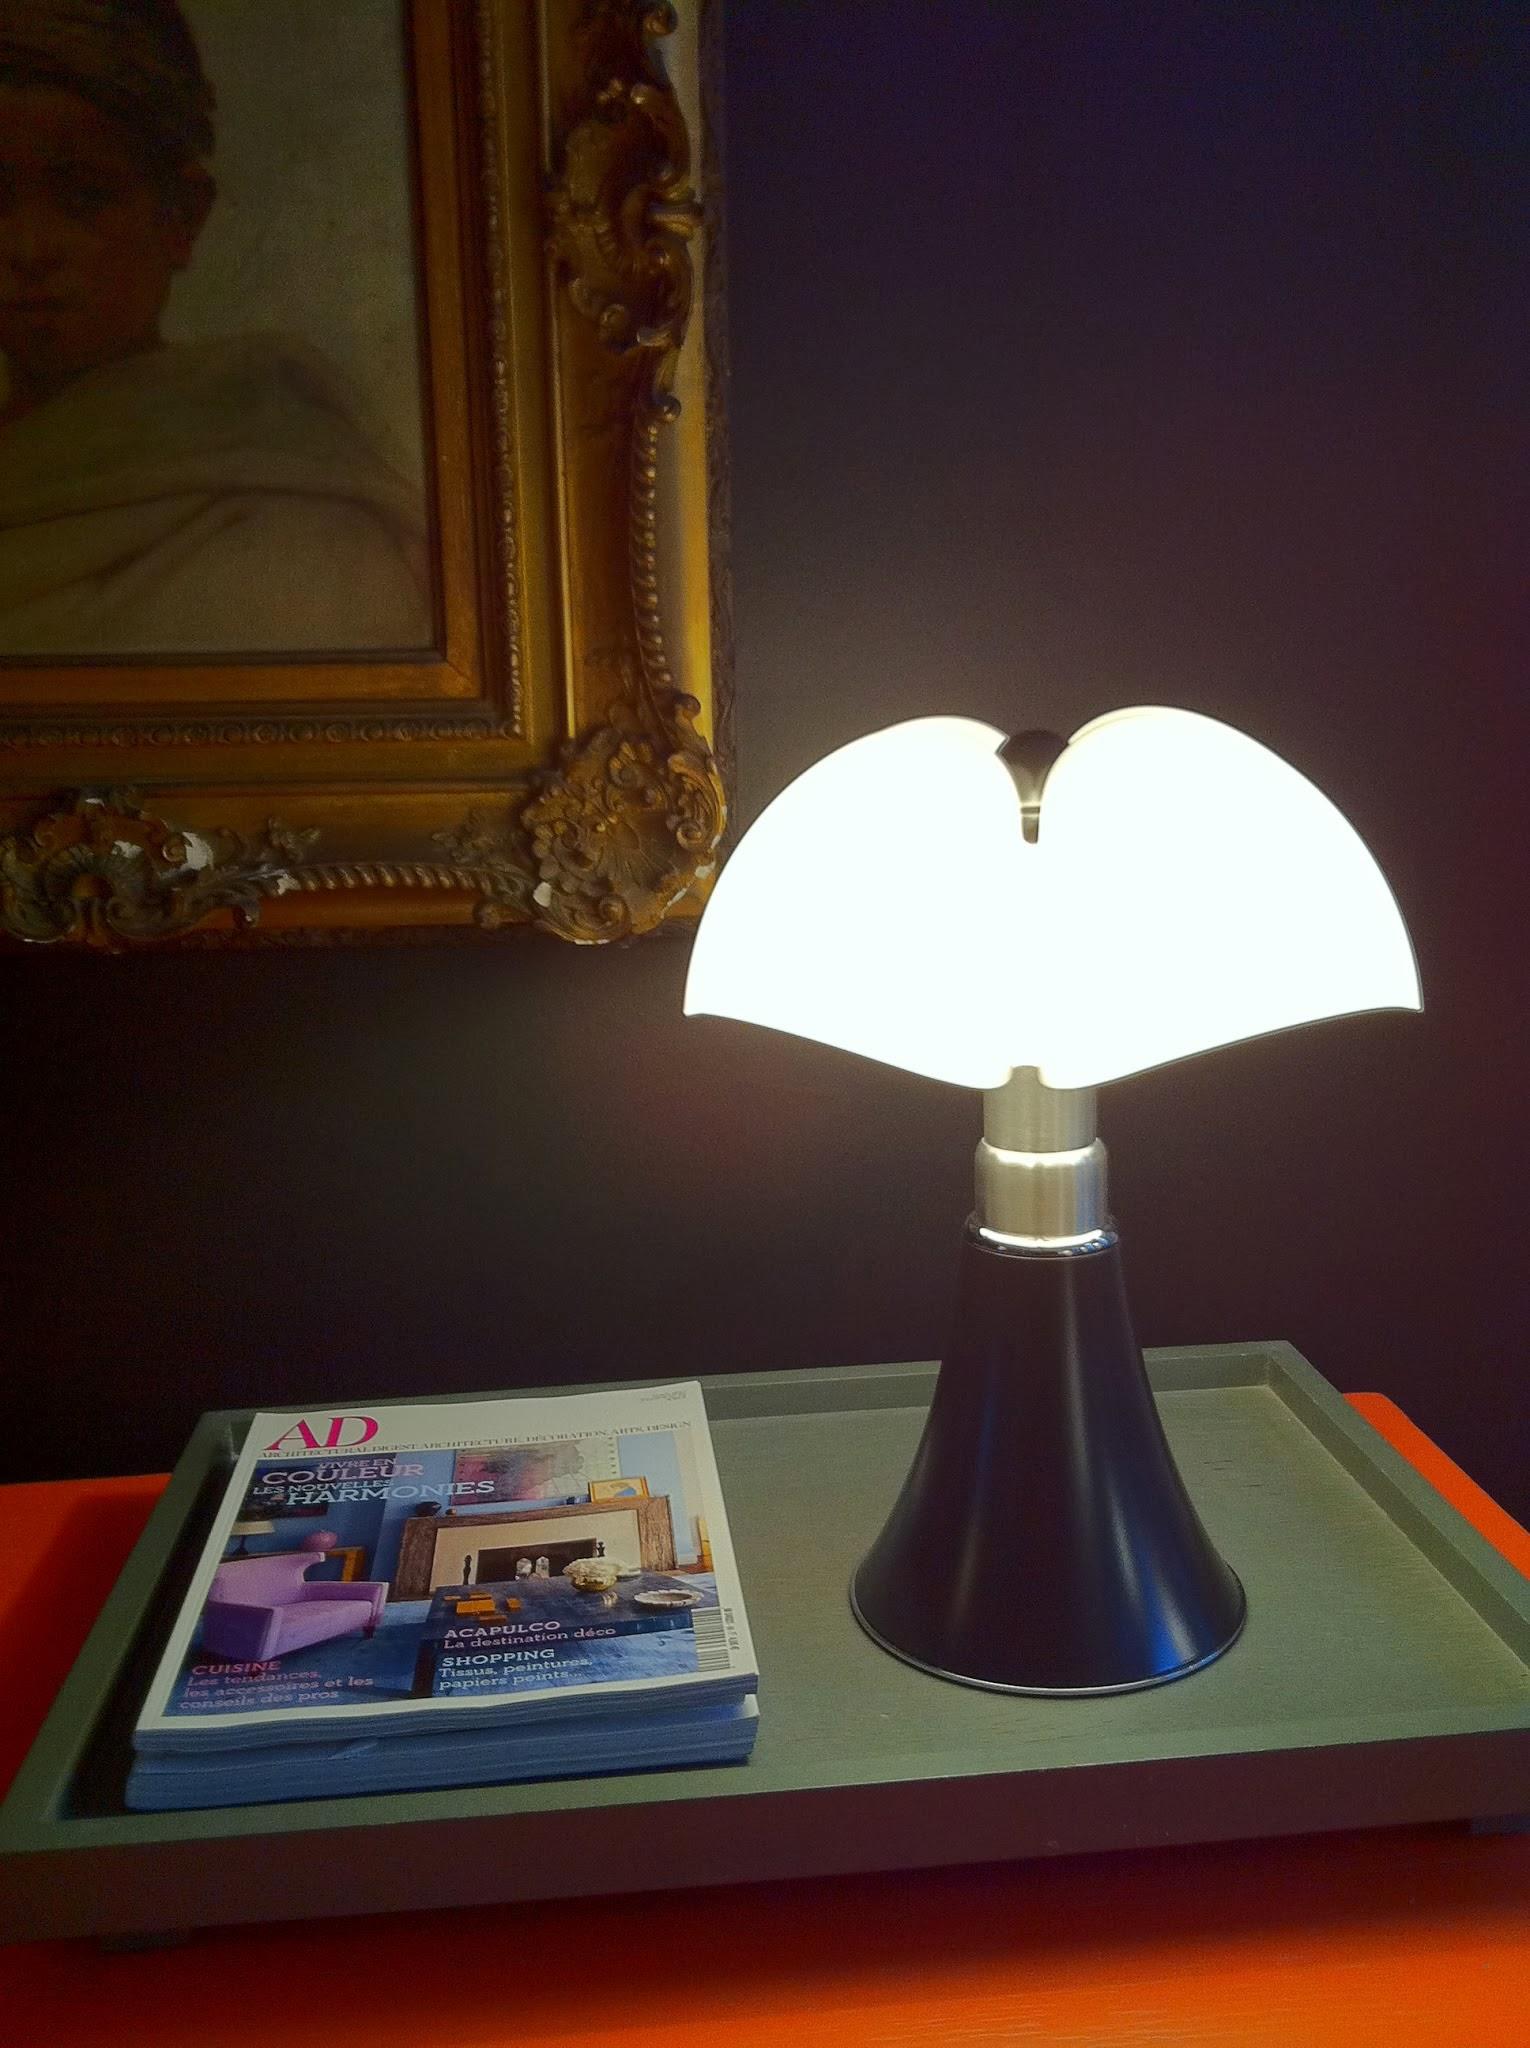 pipistrello pas cher awesome du beau et with pipistrello pas cher affordable lampe de table. Black Bedroom Furniture Sets. Home Design Ideas